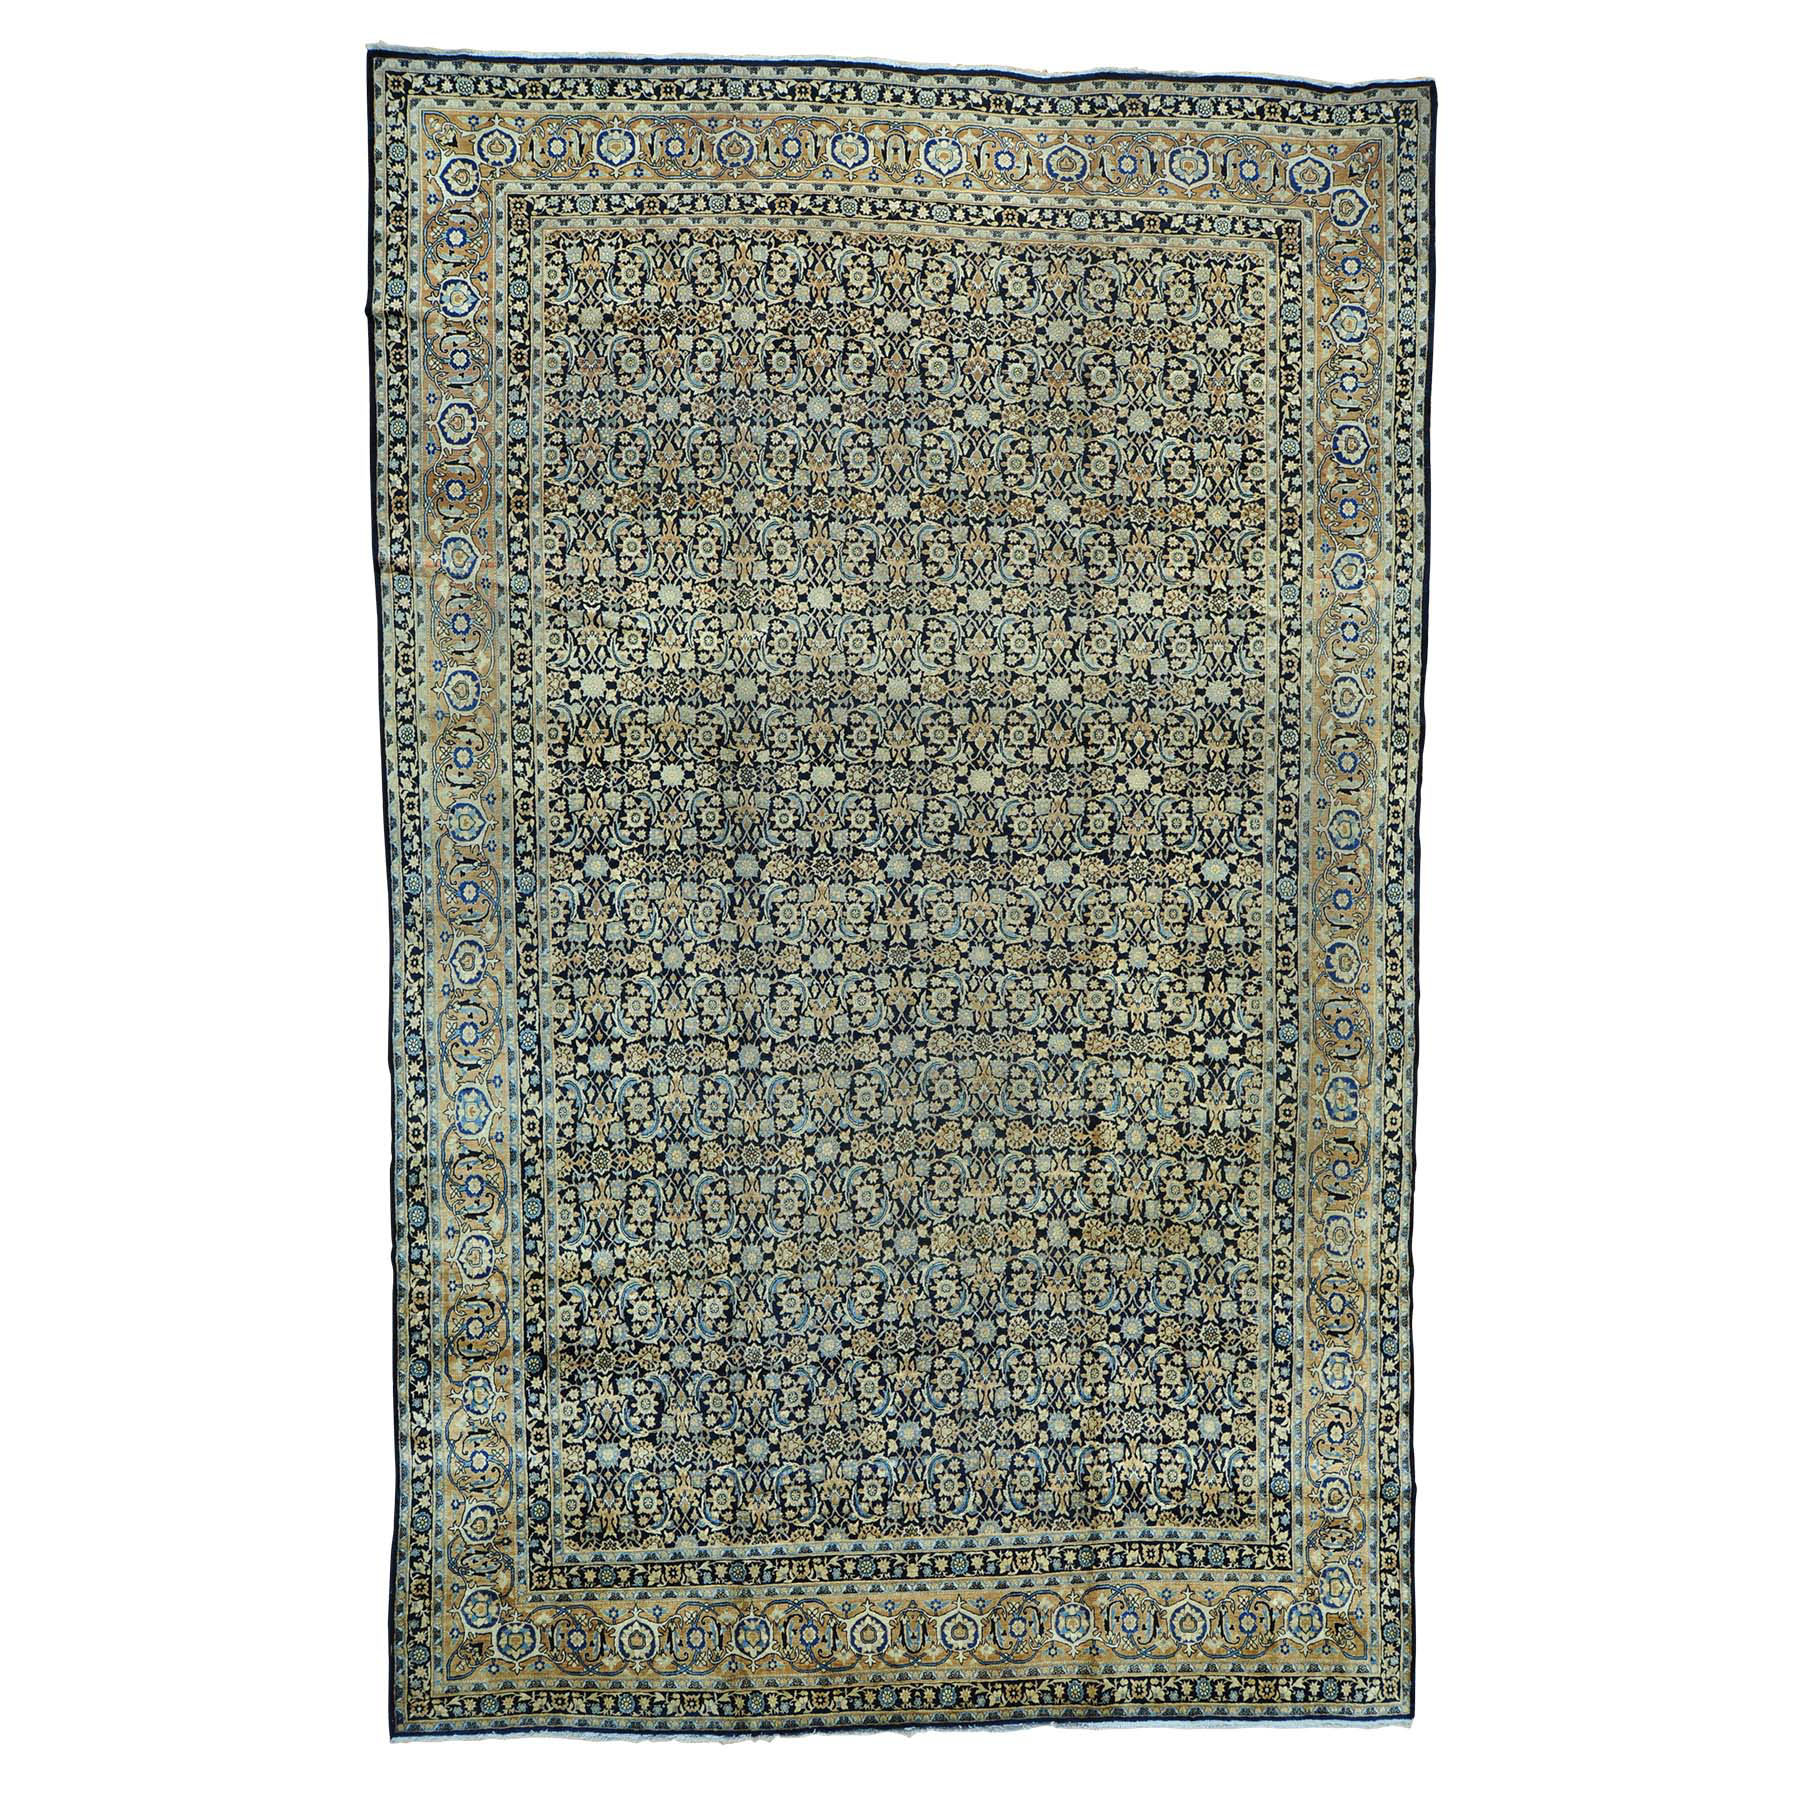 "10'10""X17' Gallery Size Antique Persian Kerman Herati Design Rug moab6db6"